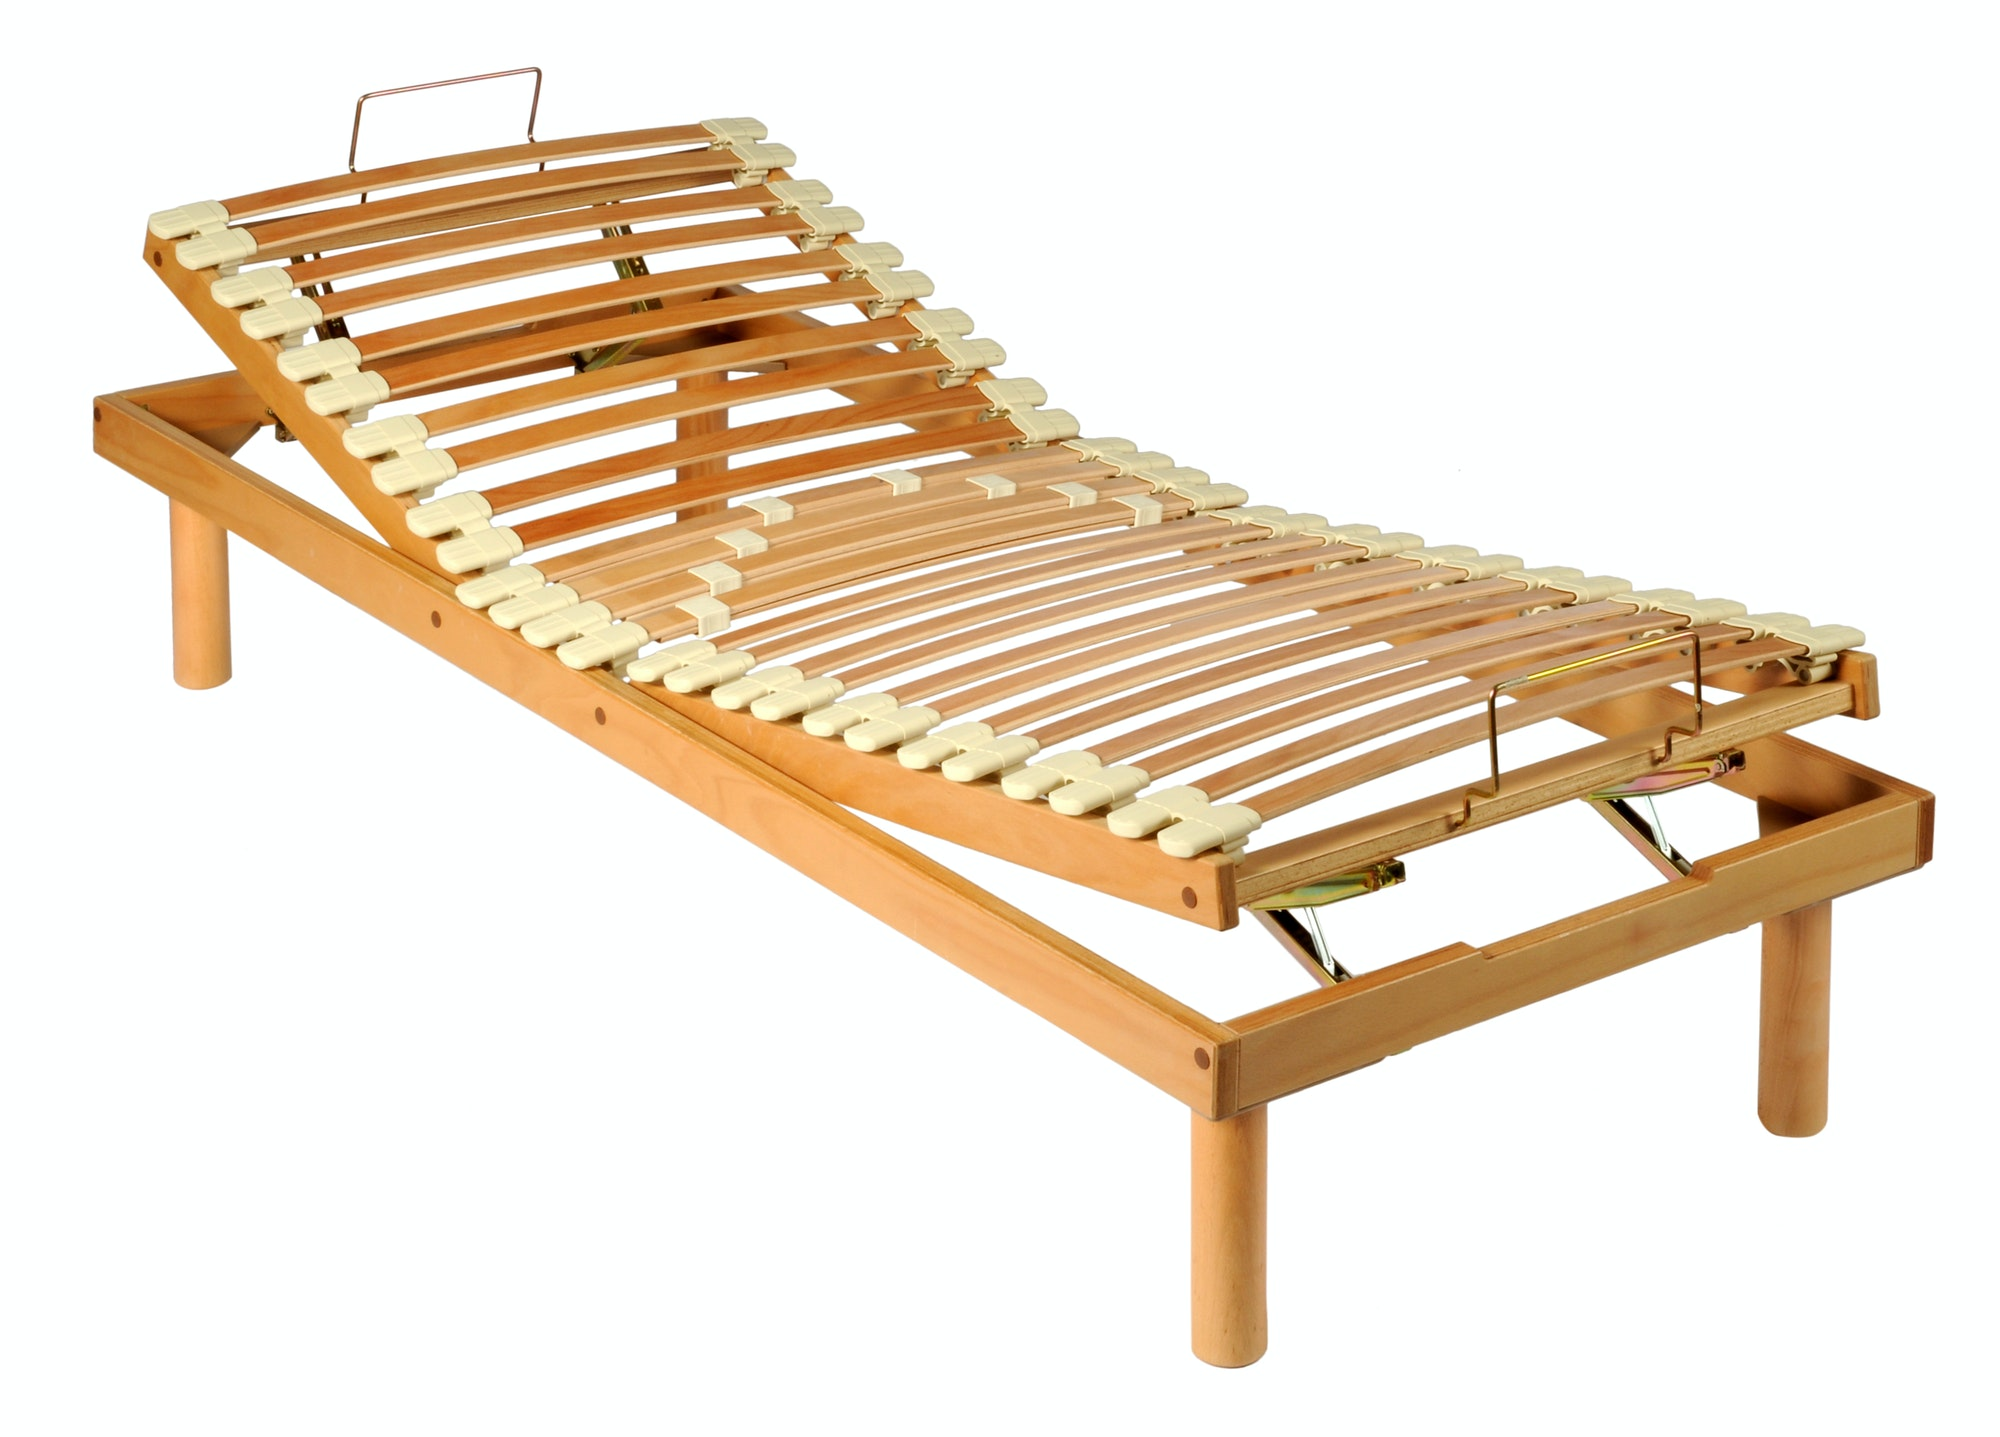 Problems With Adjustable Power Bed Bases. Wooden adjustable bed frame.